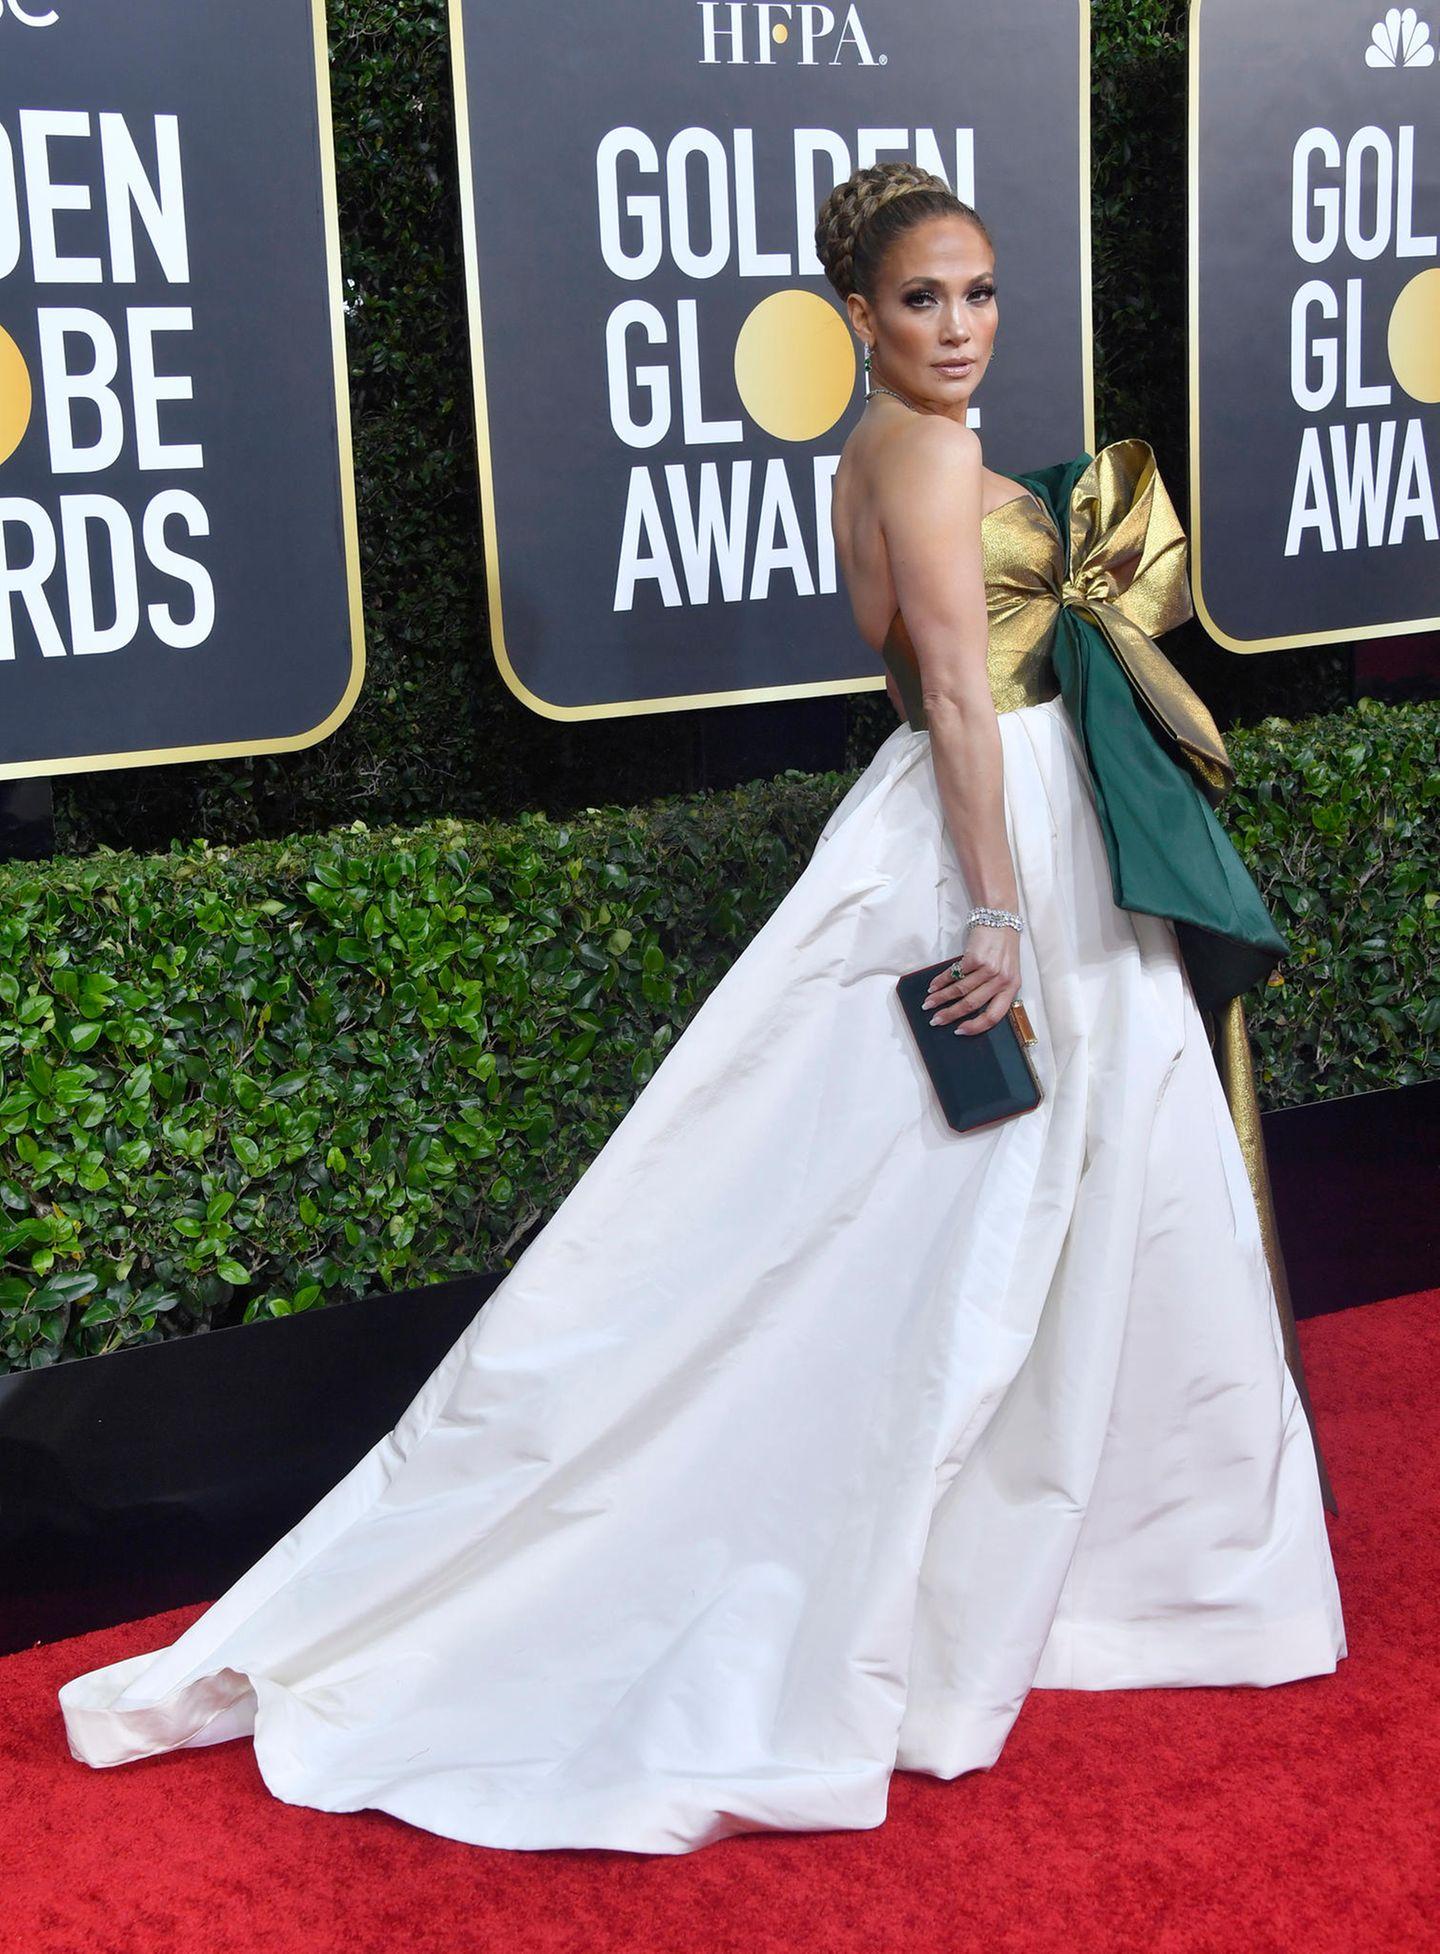 Golden Globes 2020: Jennifer Lopez